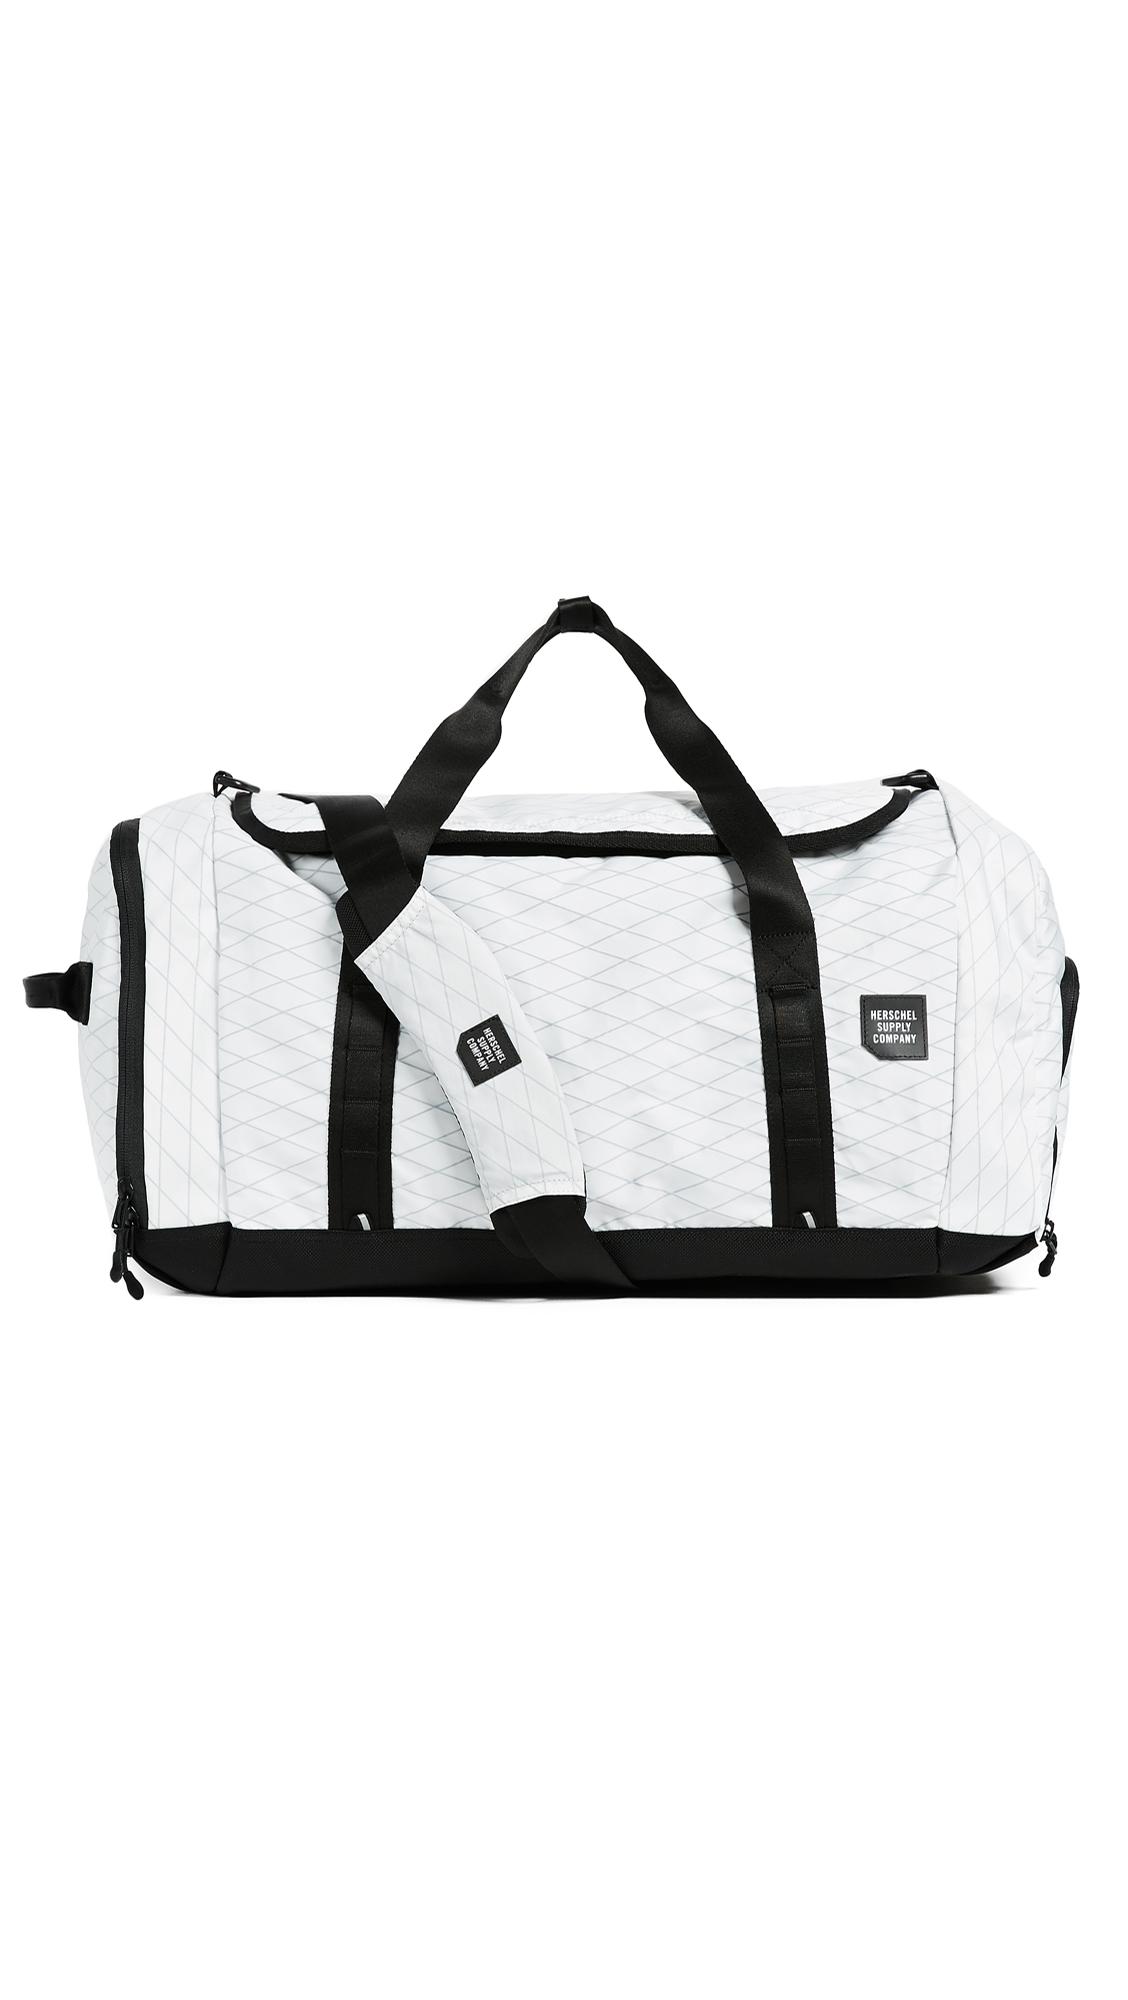 Herschel Supply Co. Gorge Large Duffel Bag In White Black   ModeSens f3302d7787